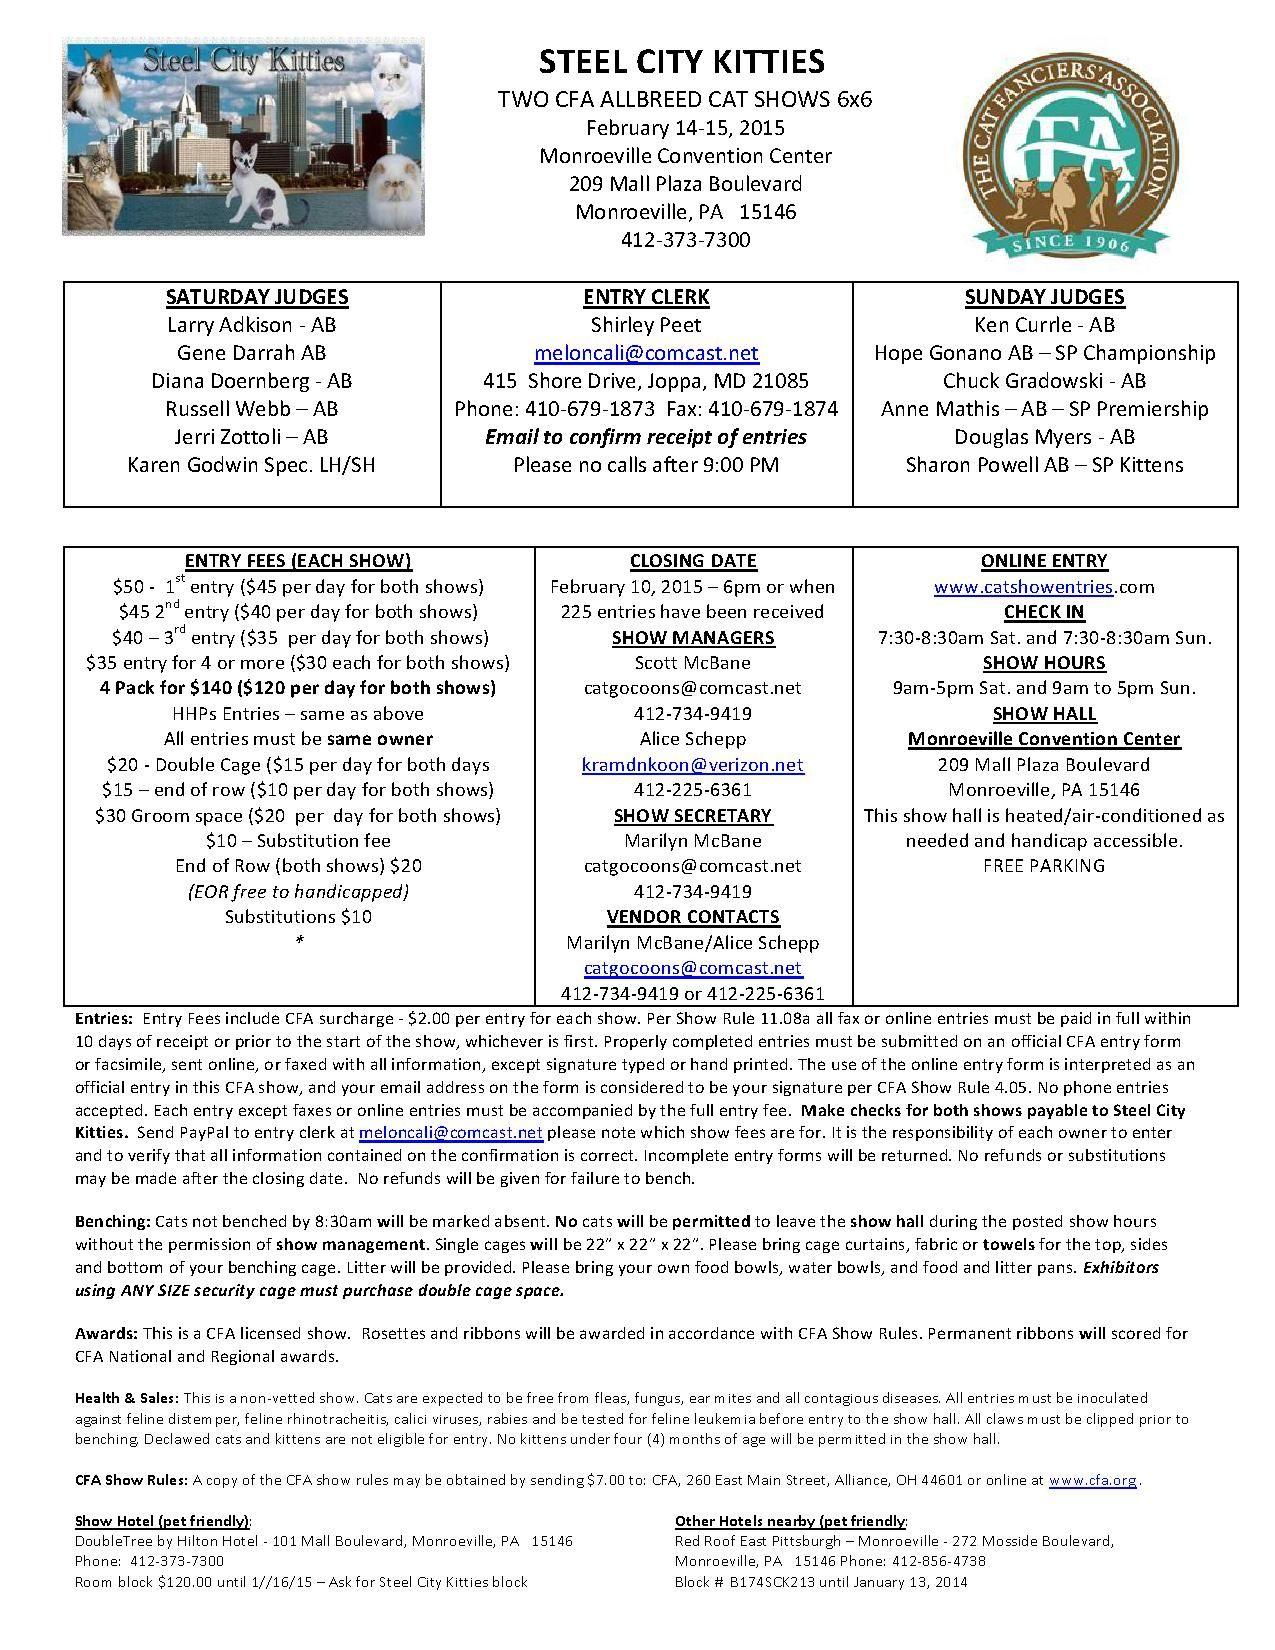 Steel City Kitties February 14 15 2015 Monroeville Pa Great Lakes Region Steel City Great Lakes